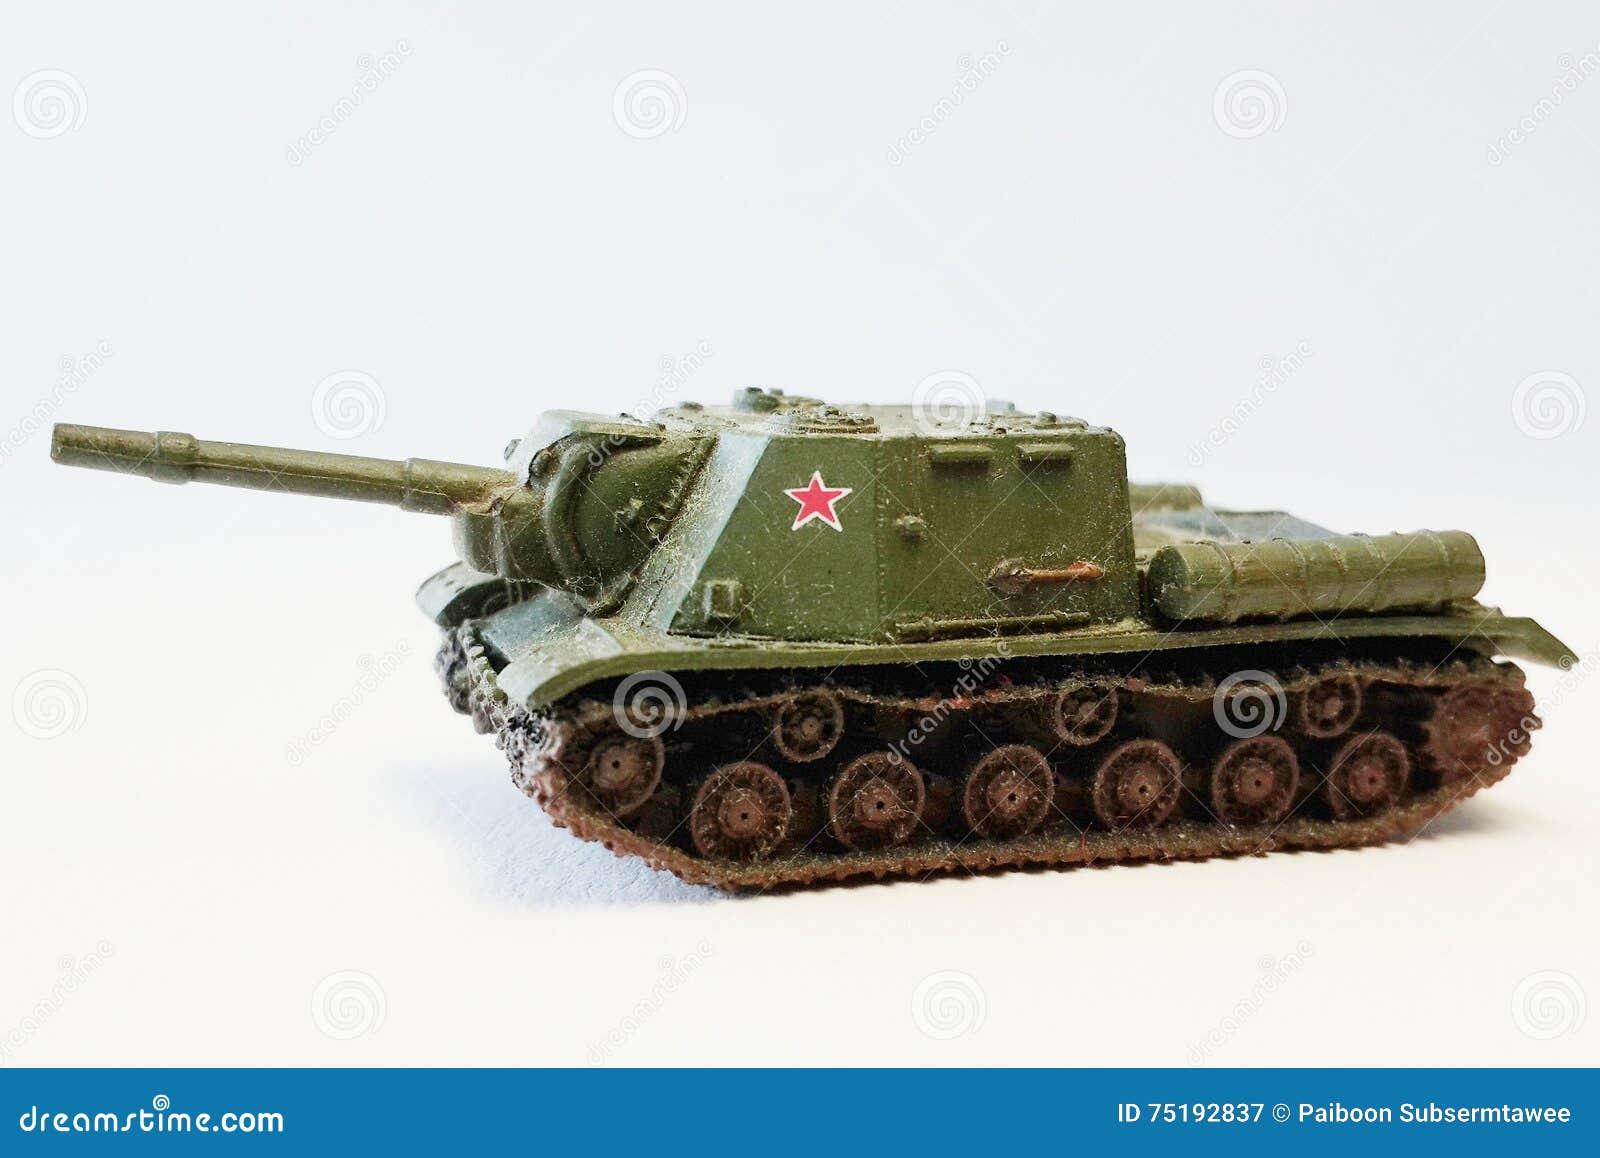 Modelos Miniatura Militares Del Tanque De Batalla Imagen De Archivo Imagen De Arma Tanque 75192837